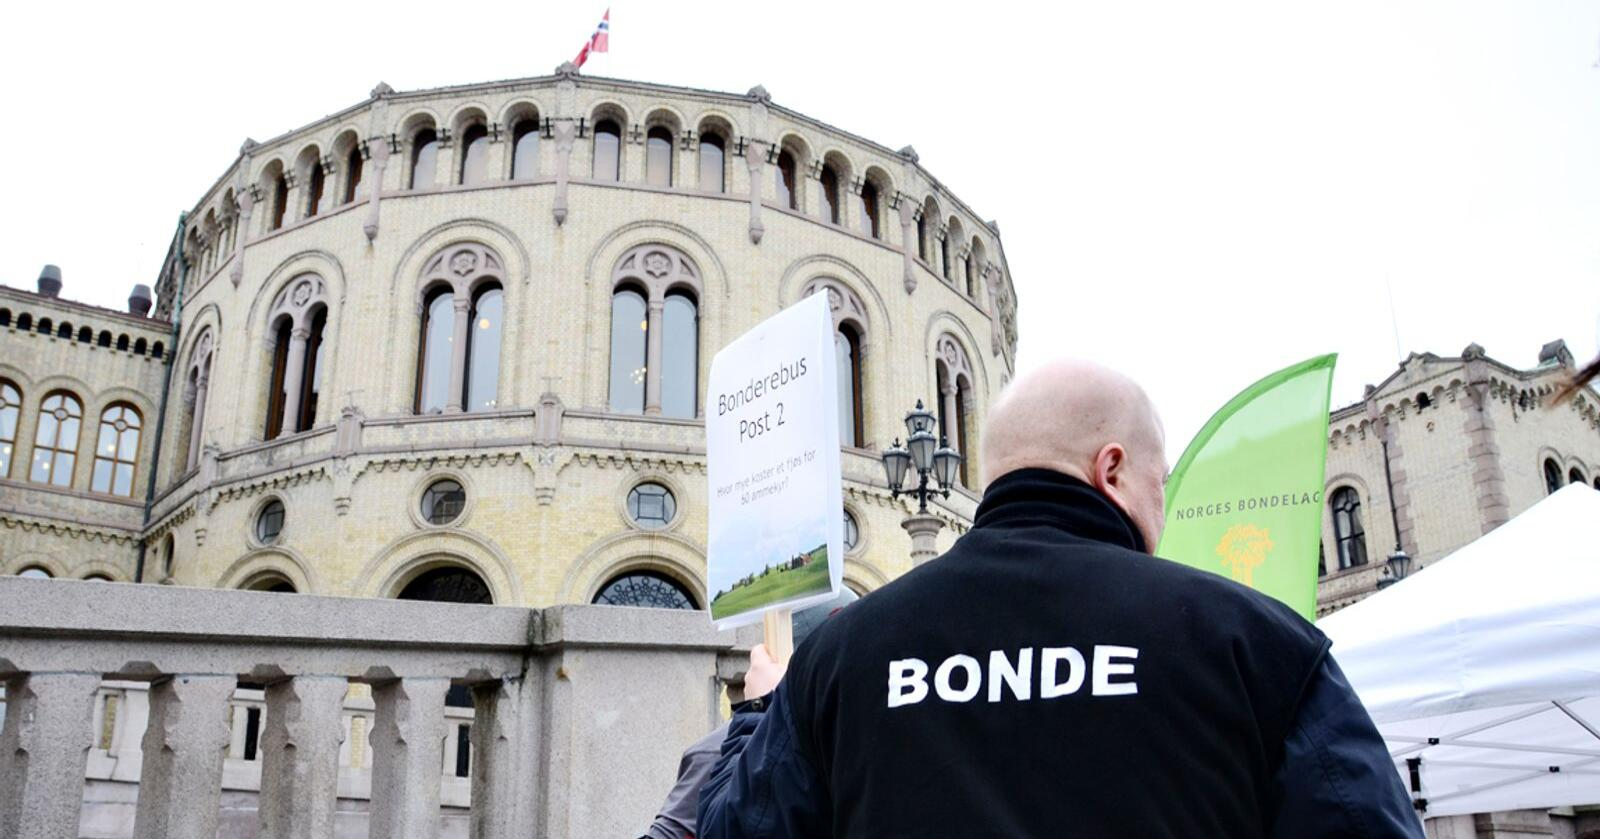 Klage: Bør klagebehandlingen flyttes ut fra Mattilsynet? Flere landbrukspolitiske talspersoner til partiene på Stortinget støtter dette. (Arkivfoto)